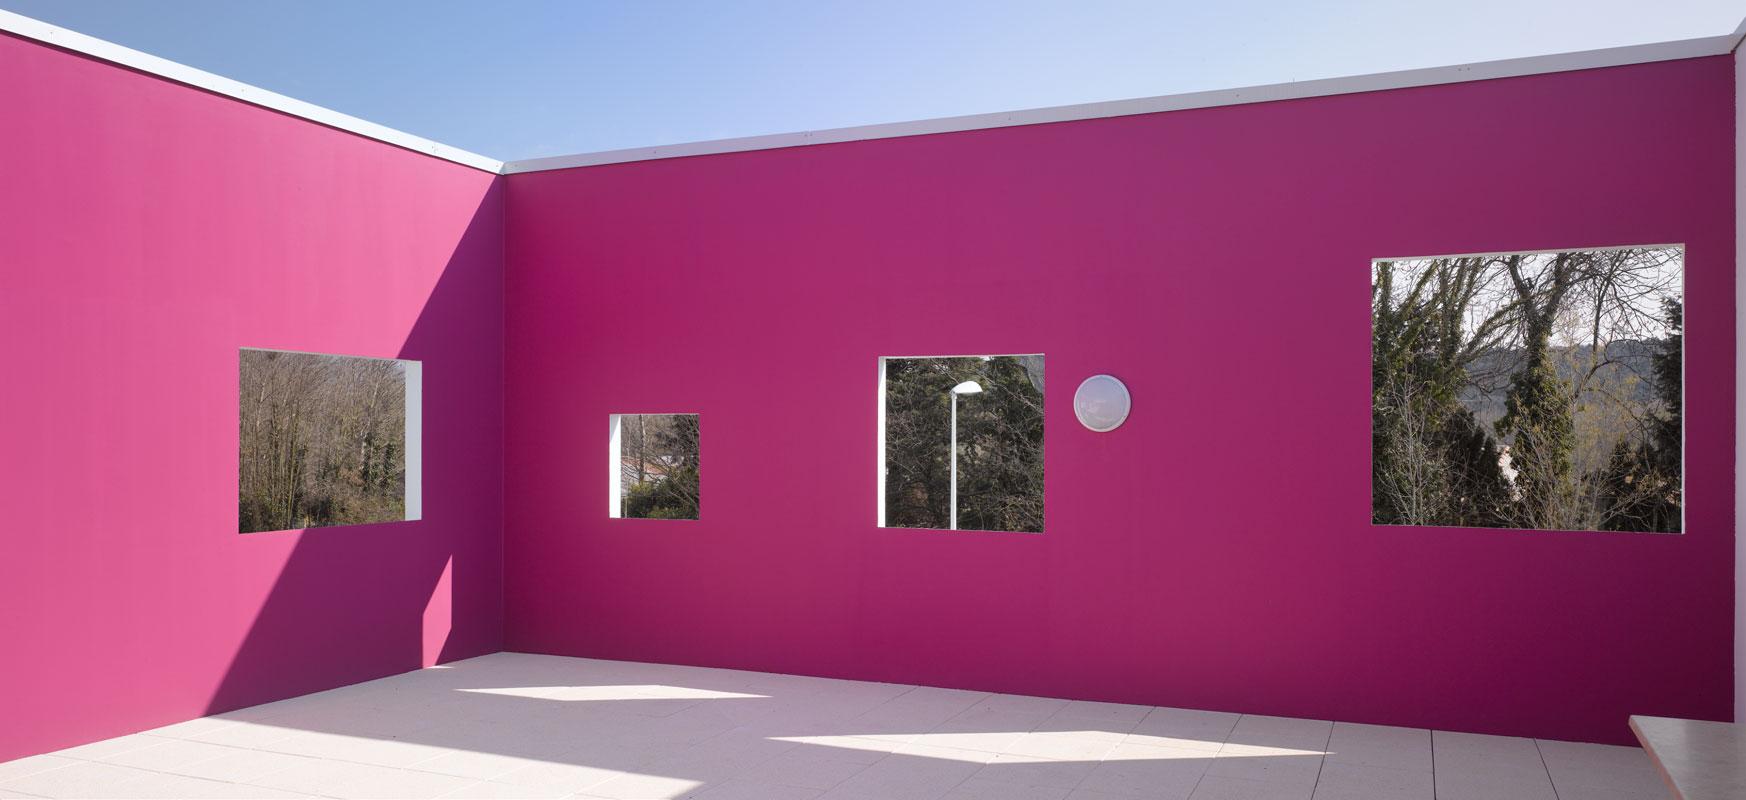 david giancatarinaarchitecture david giancatarina. Black Bedroom Furniture Sets. Home Design Ideas